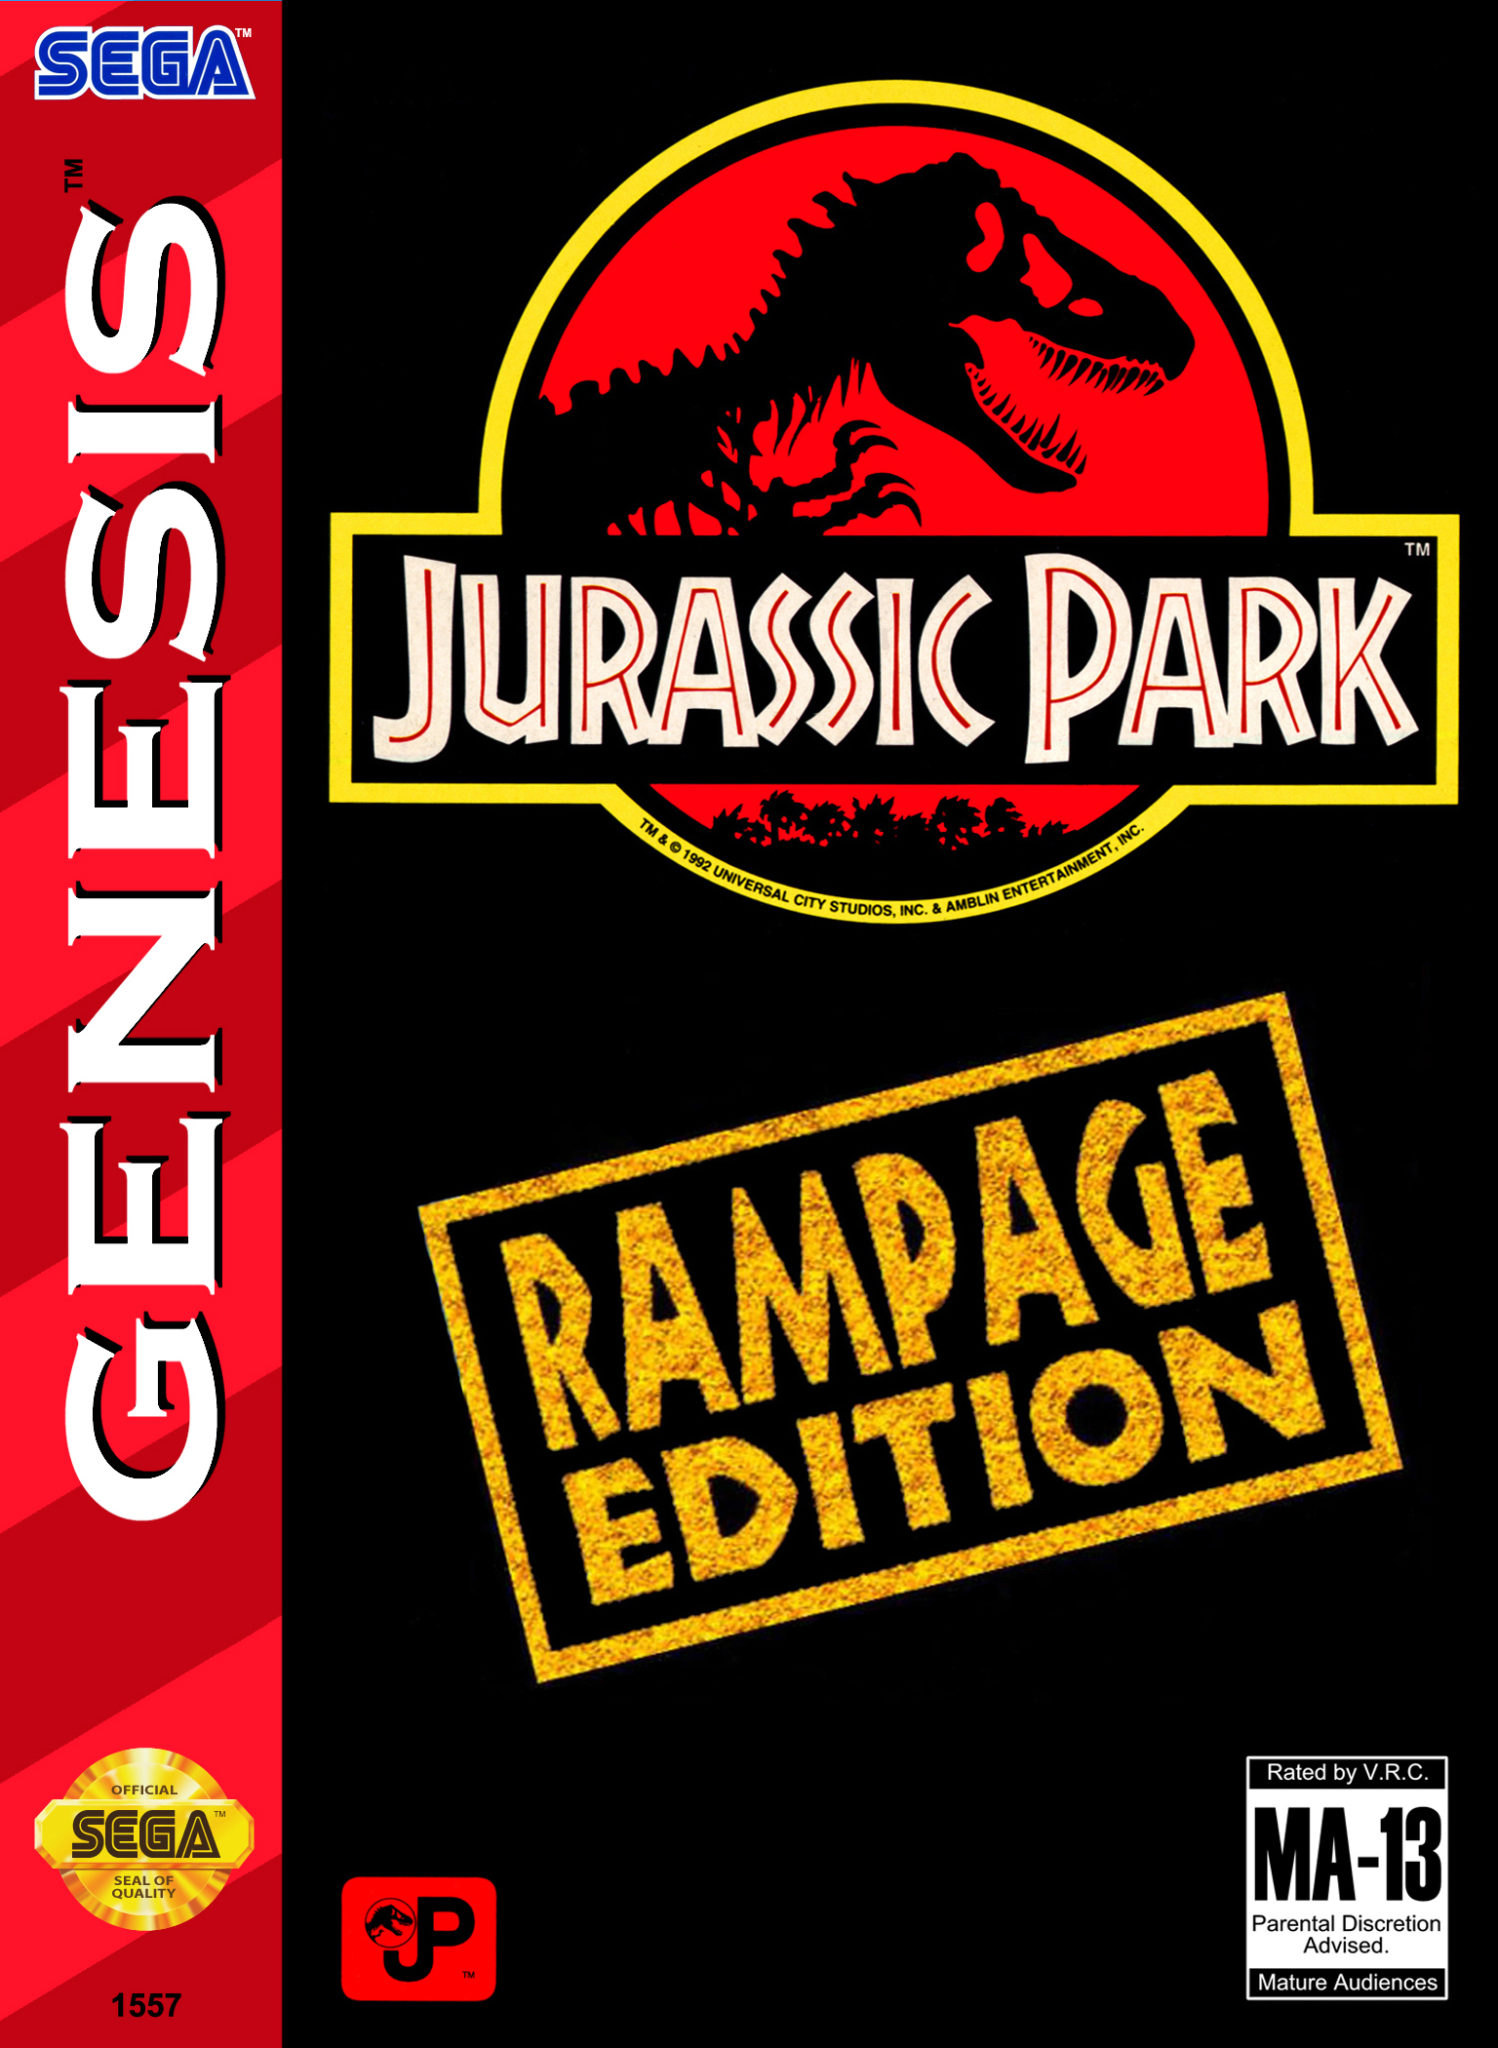 Retro_review_Jurassic_Park_rampage_Edition_box_art